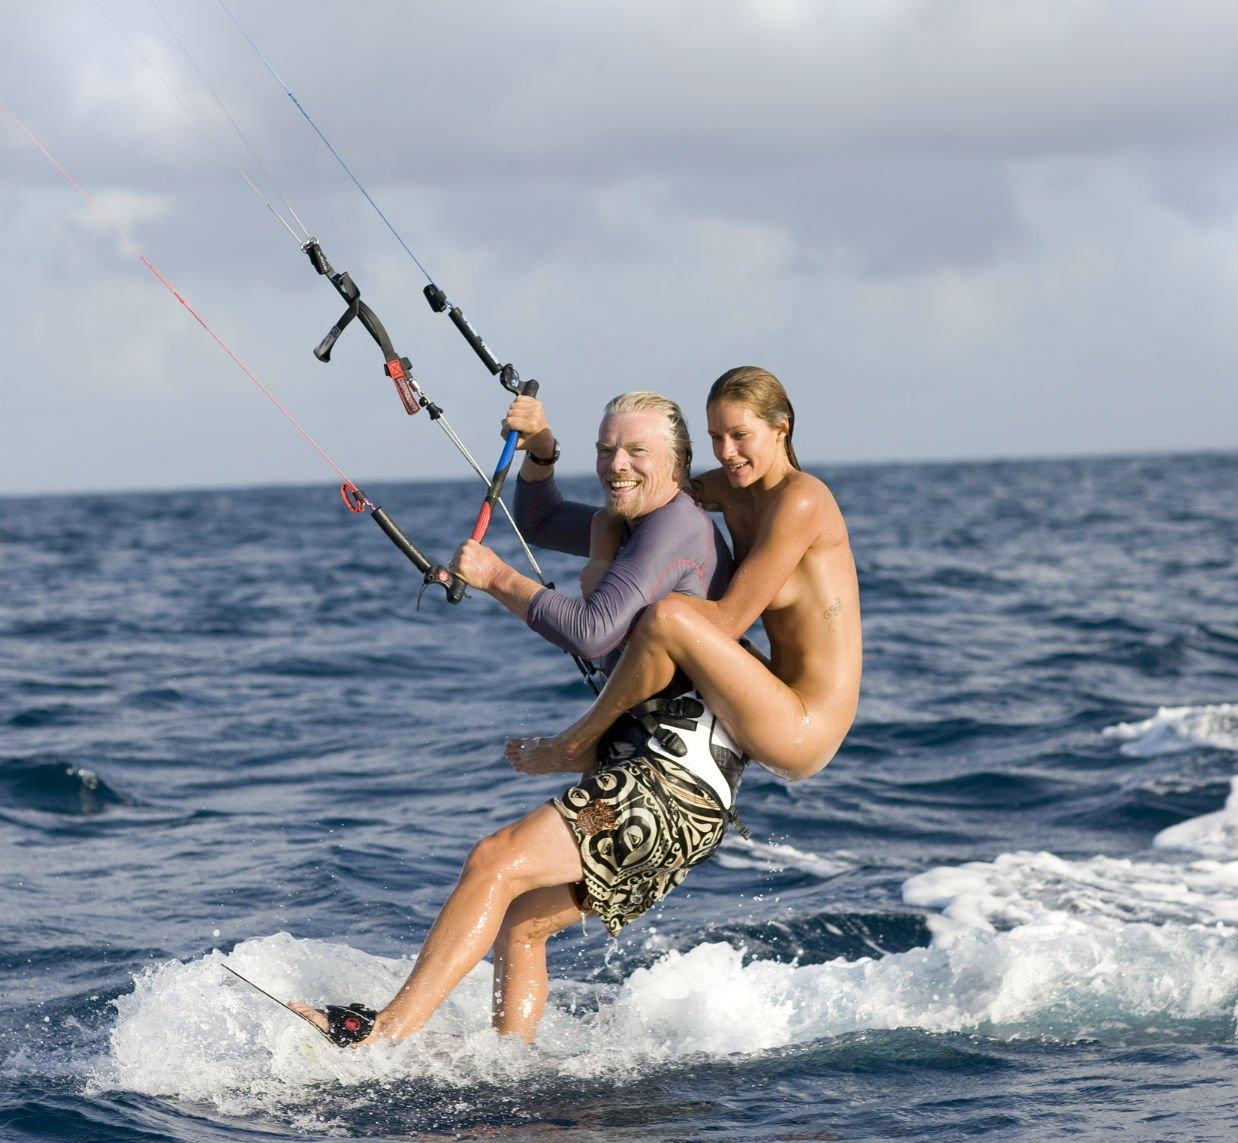 A little bit of friendly kitesurfing competition   Virgin